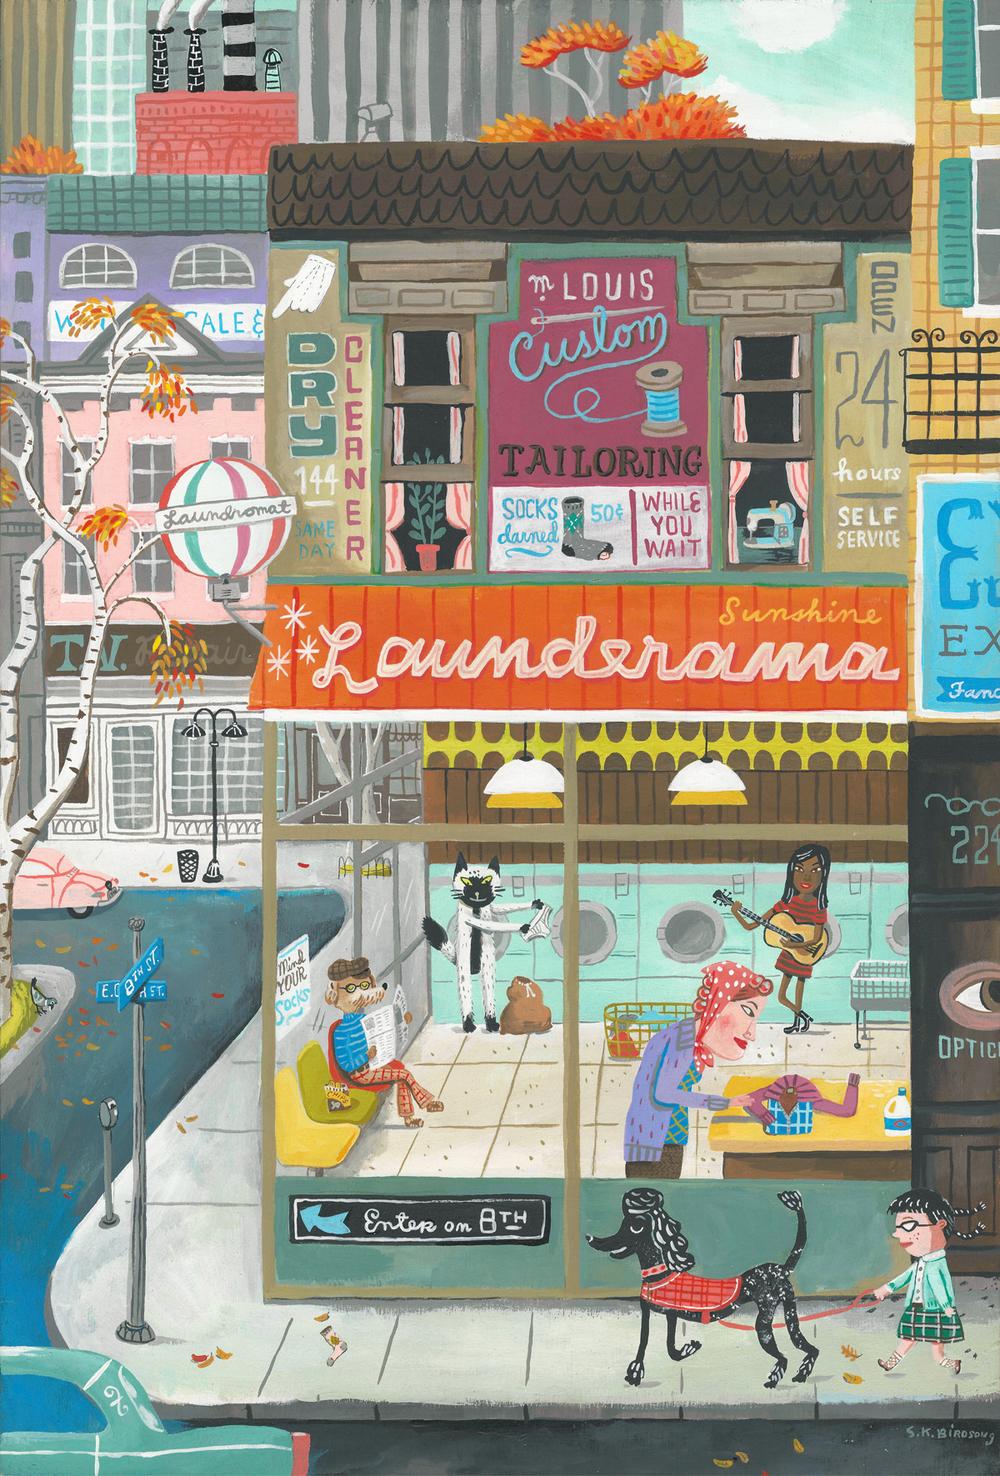 The Sunshine Launderama. New in my Etsy shop